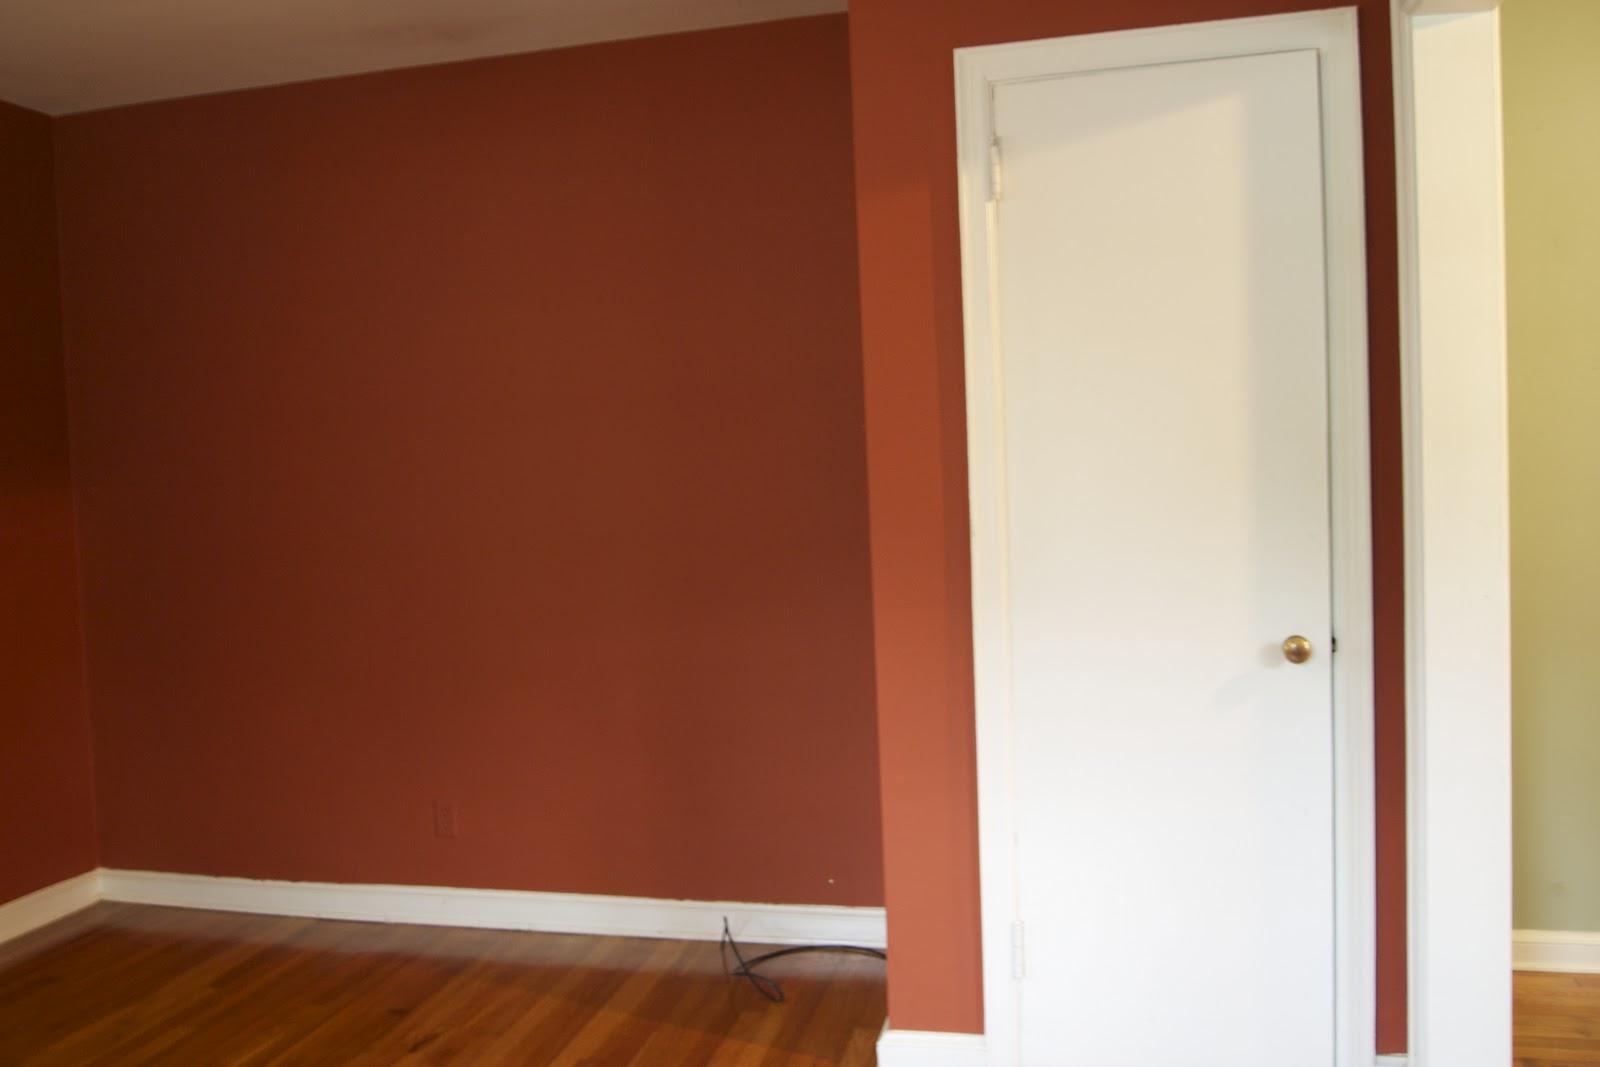 Burnt orange color schemes viewing gallery - Burnt orange color scheme ...